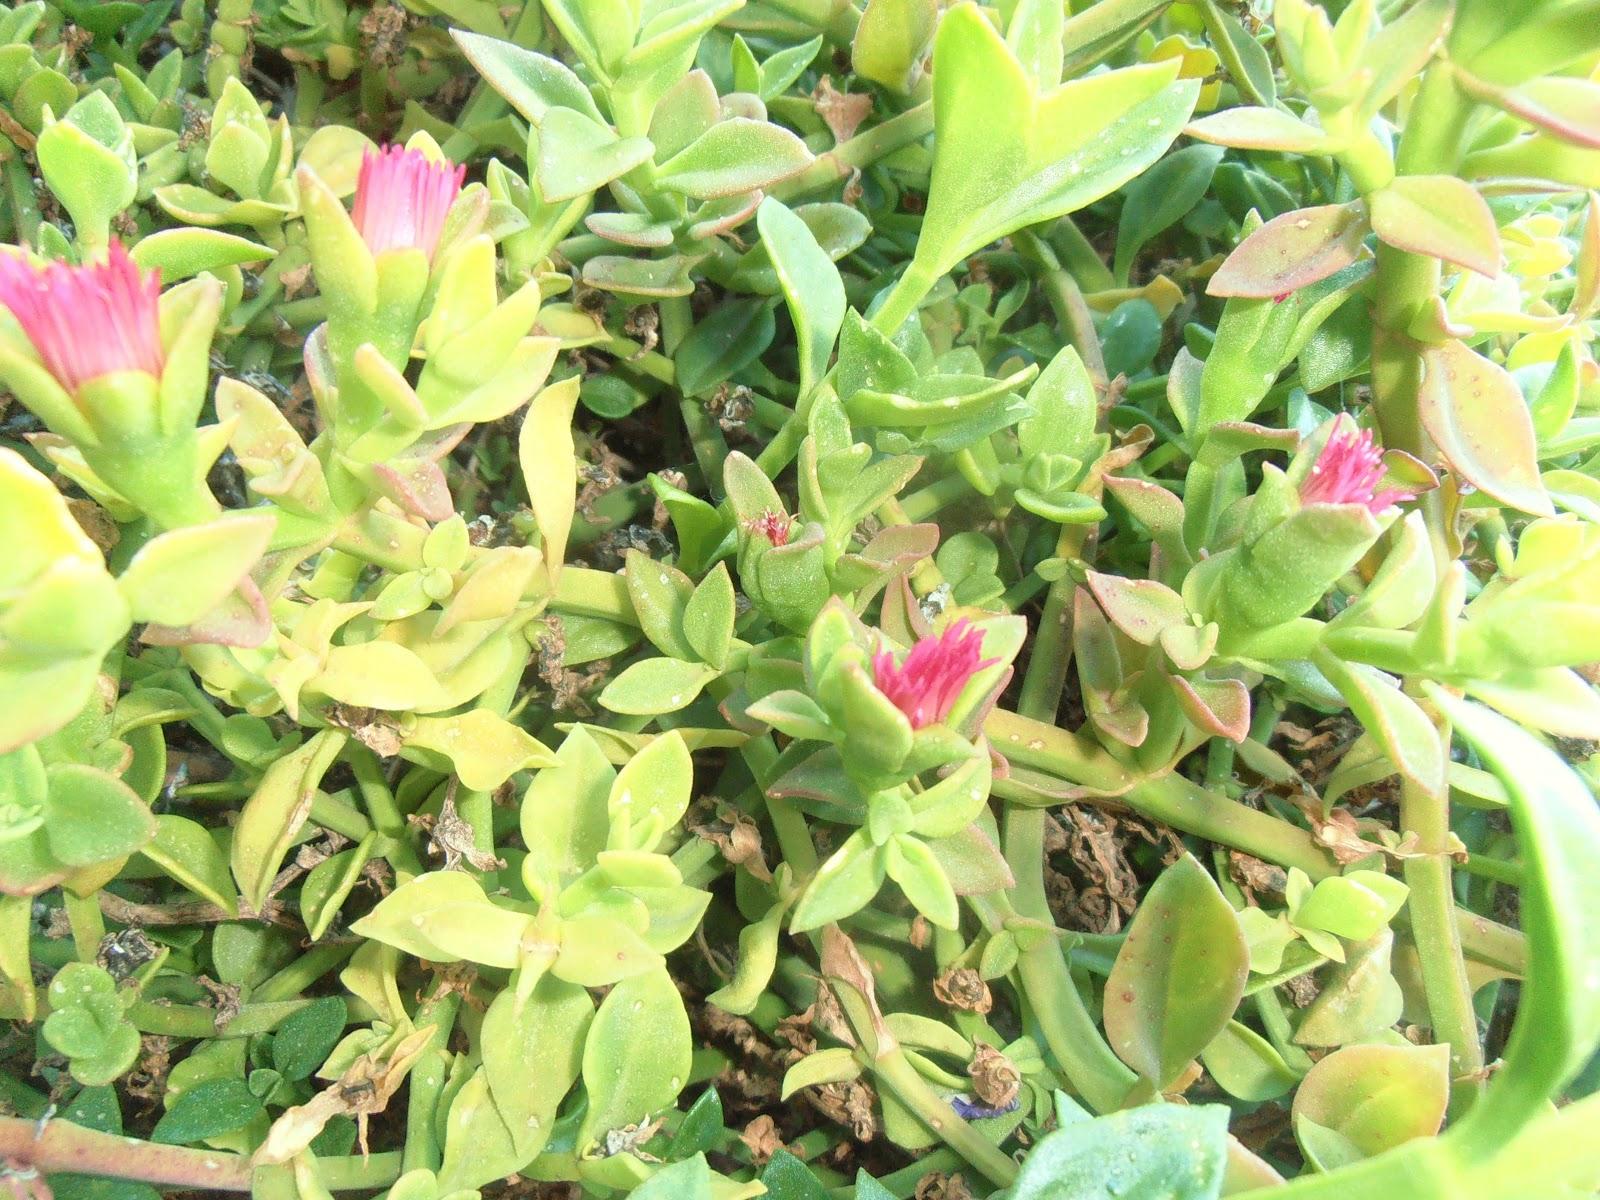 La ventana de javiruli plantas crasas 6 roc o for Plantas crasas interior